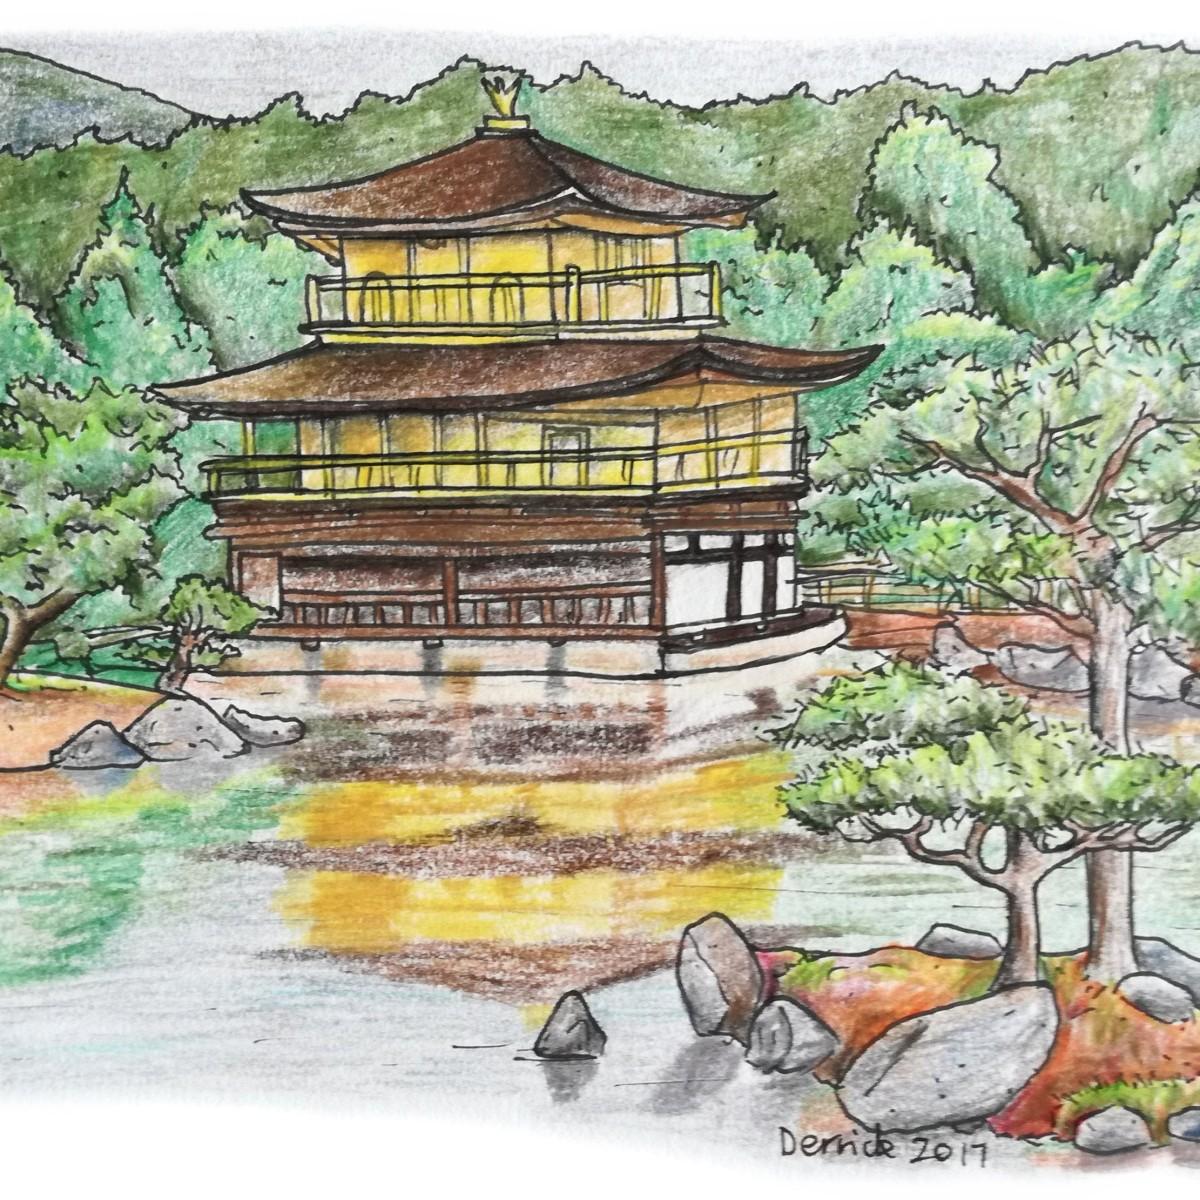 Sketch of Kinkaku-ji reflecting in the still water of a lake